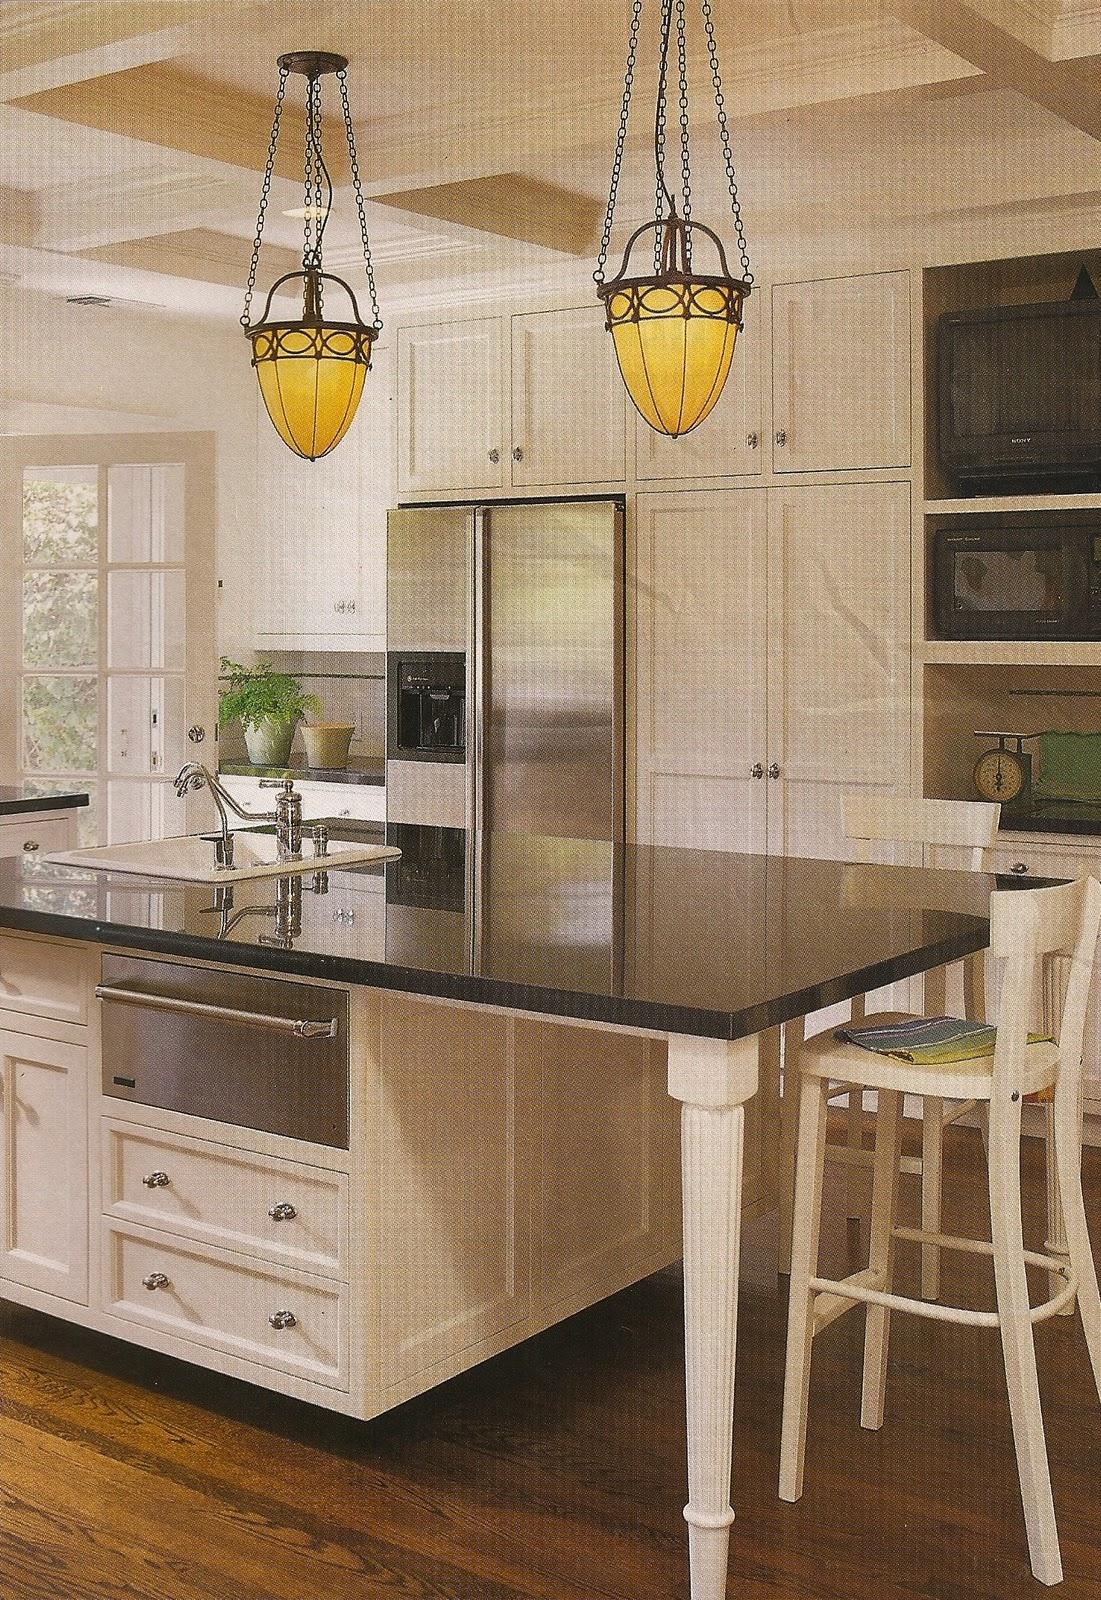 white kitchens: always classic